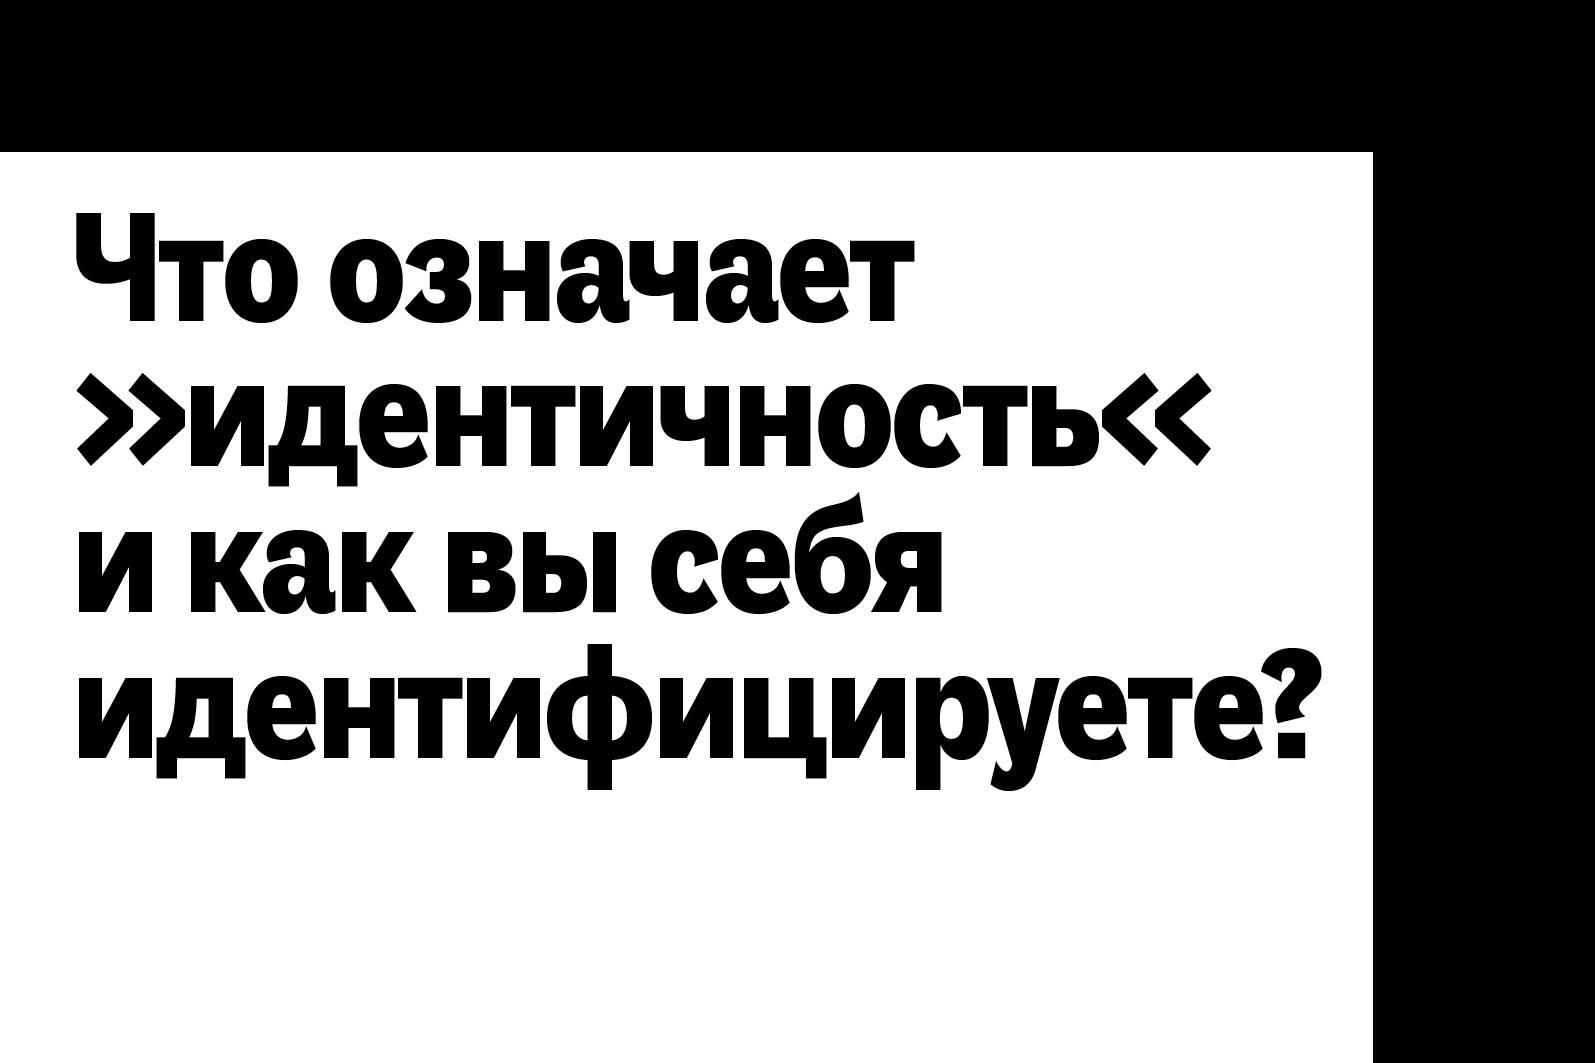 150408_Fragenkatalog_C_seite 10176